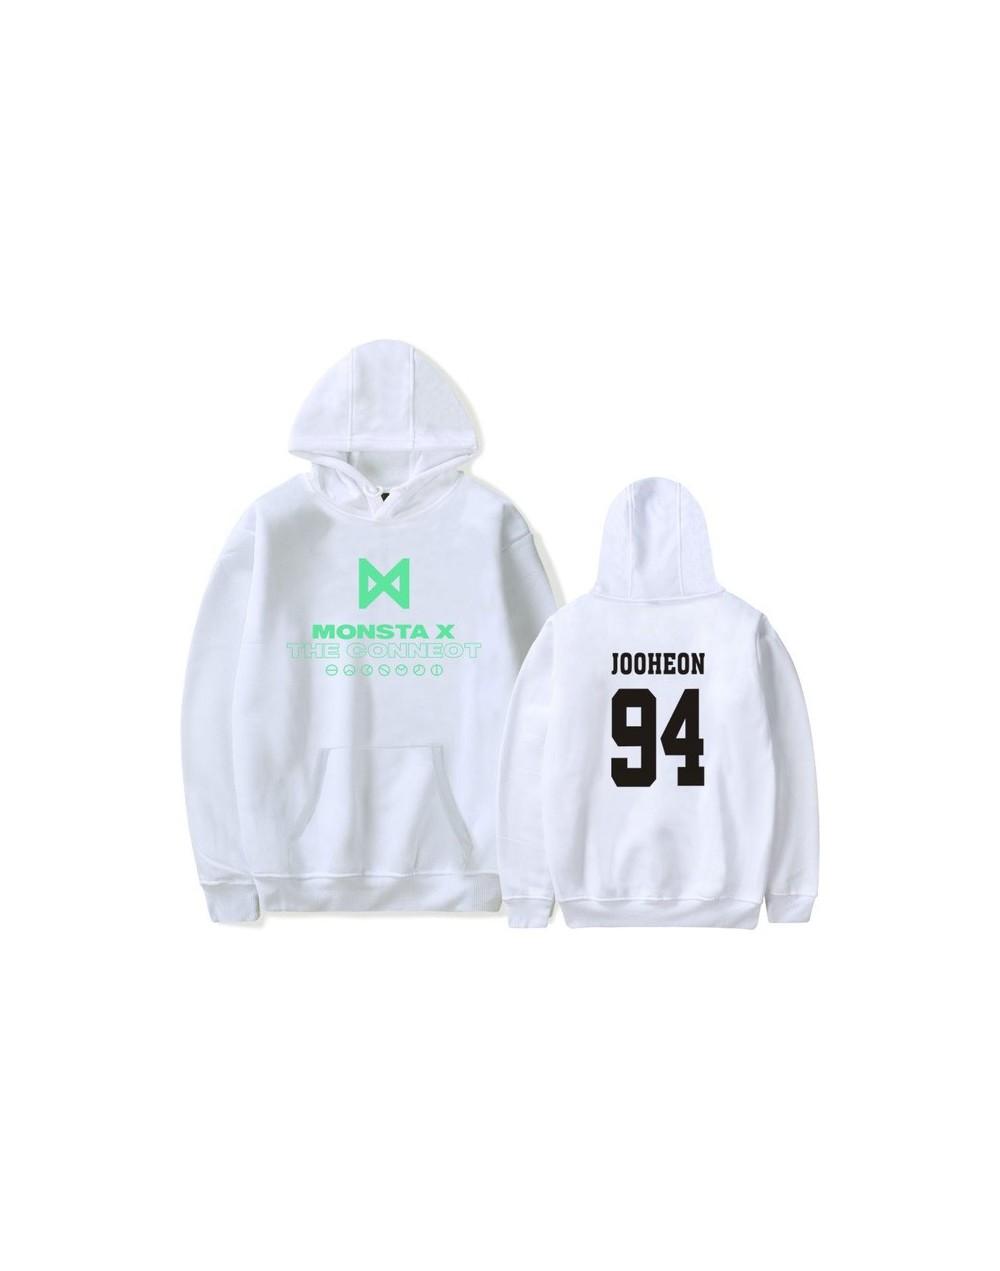 Kpop Fans Sweatshirt Women Men MONSTA X Latest Album Hoodies Long Sleeve Casual Women's Pullovers Fleece Tracksuits - White ...